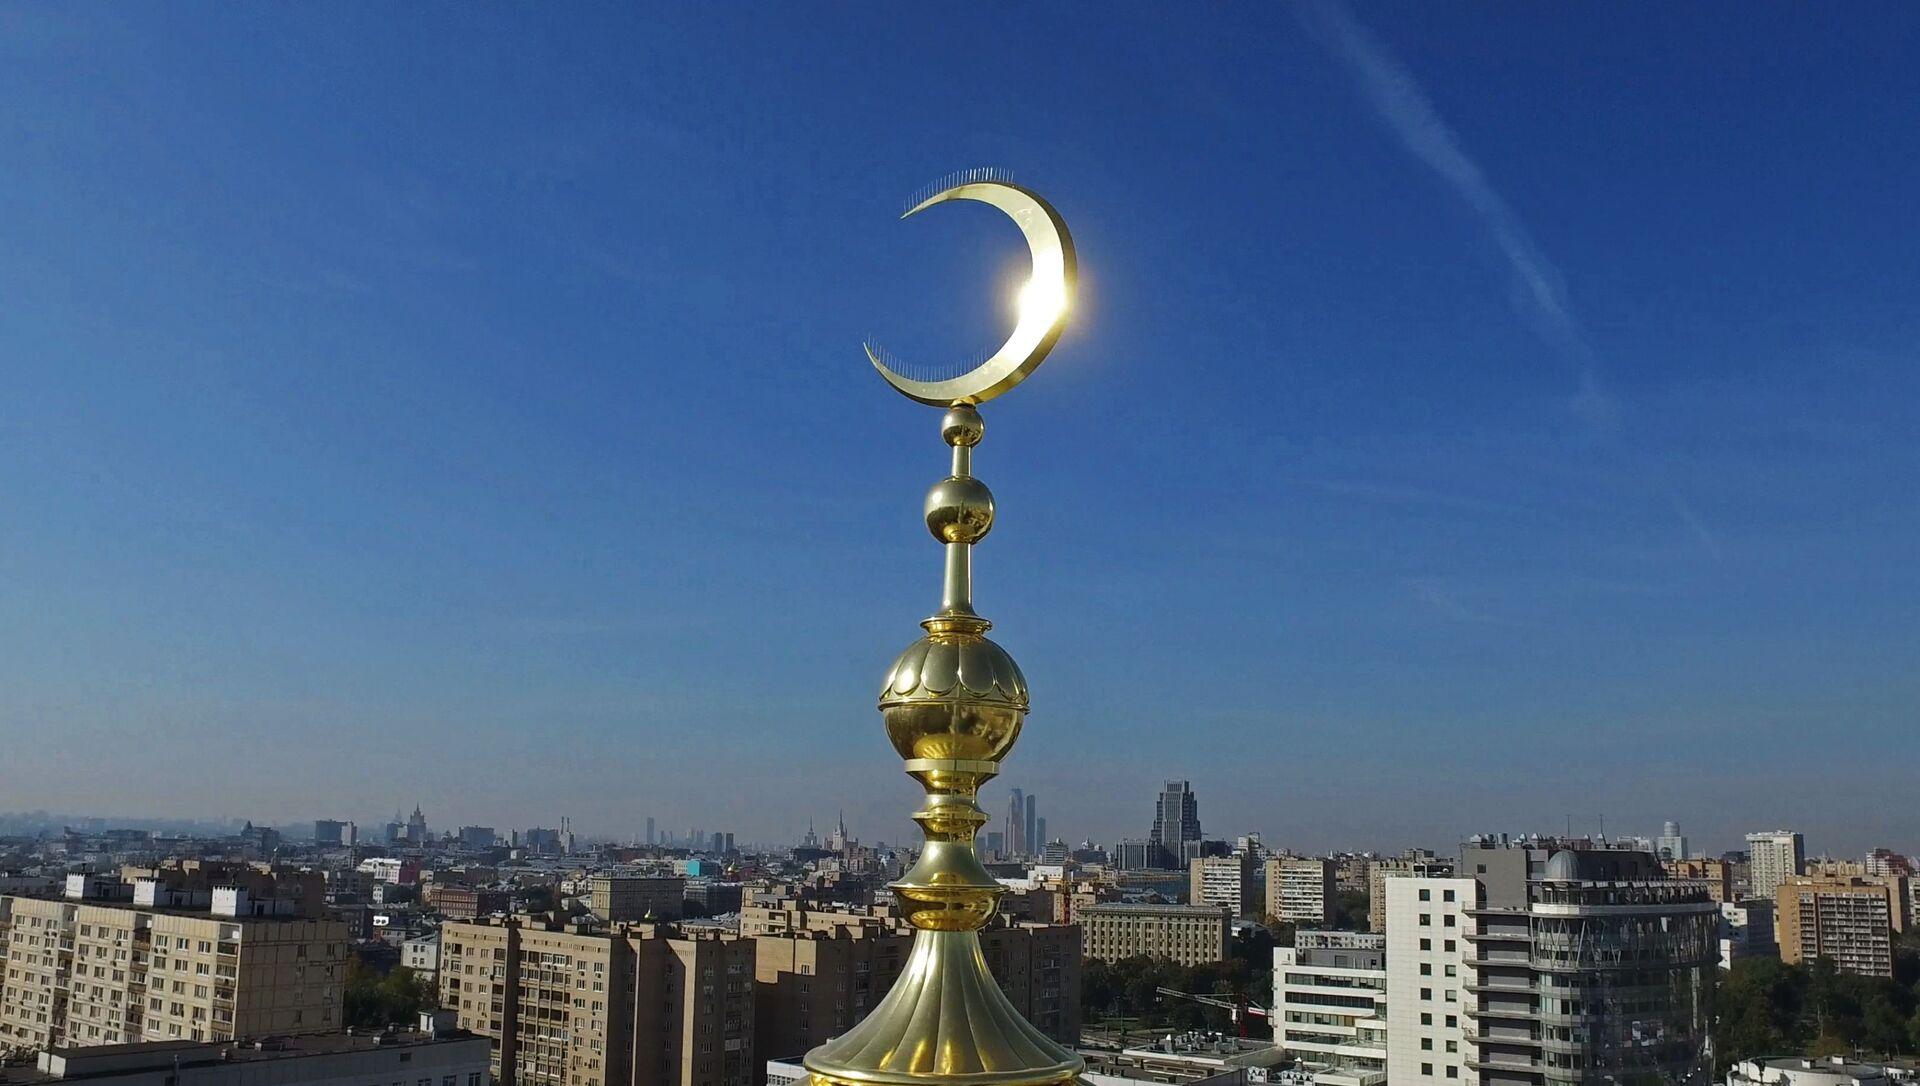 Cúpula de la Mezquita Catedral de Moscú - Sputnik Mundo, 1920, 08.02.2021